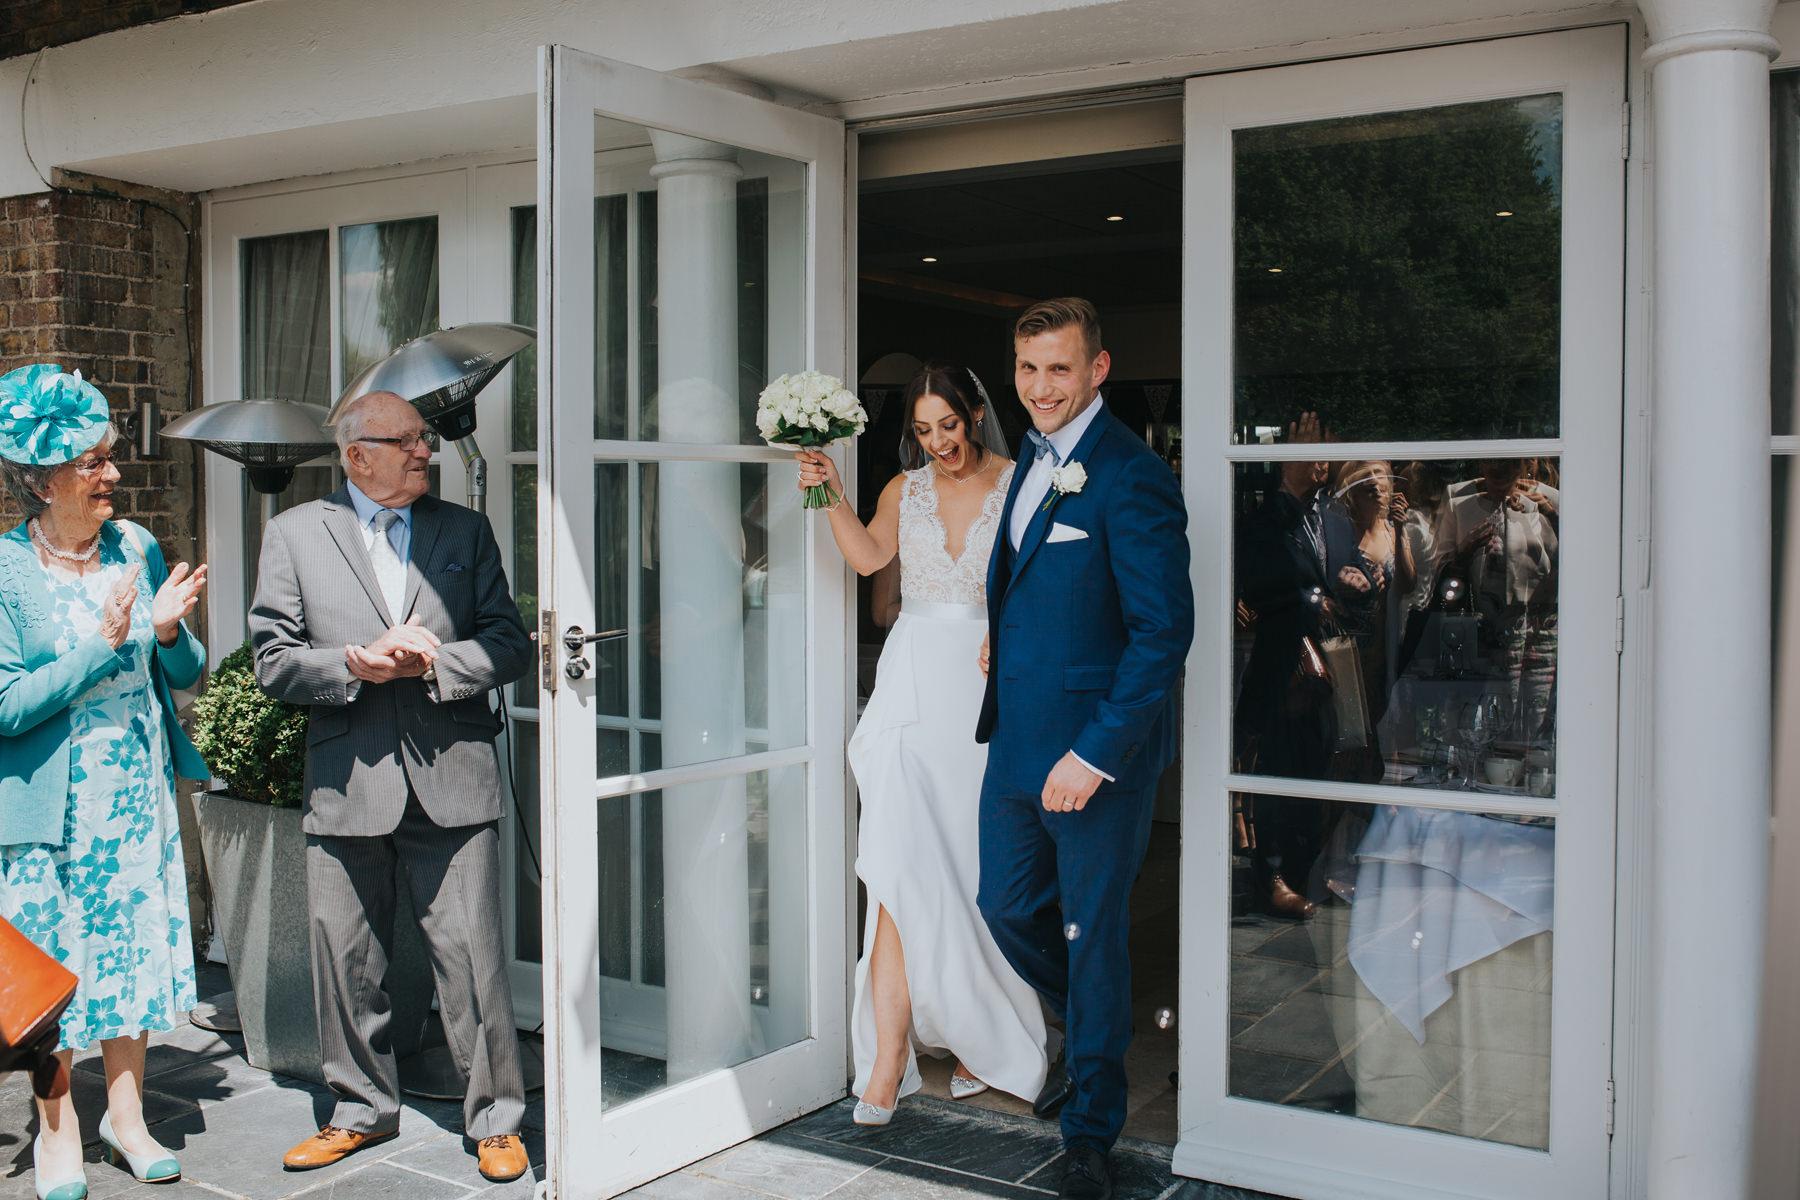 CRL-220-The Bingham Wedding Richmond-groom bride guests blowing bubbles.jpg